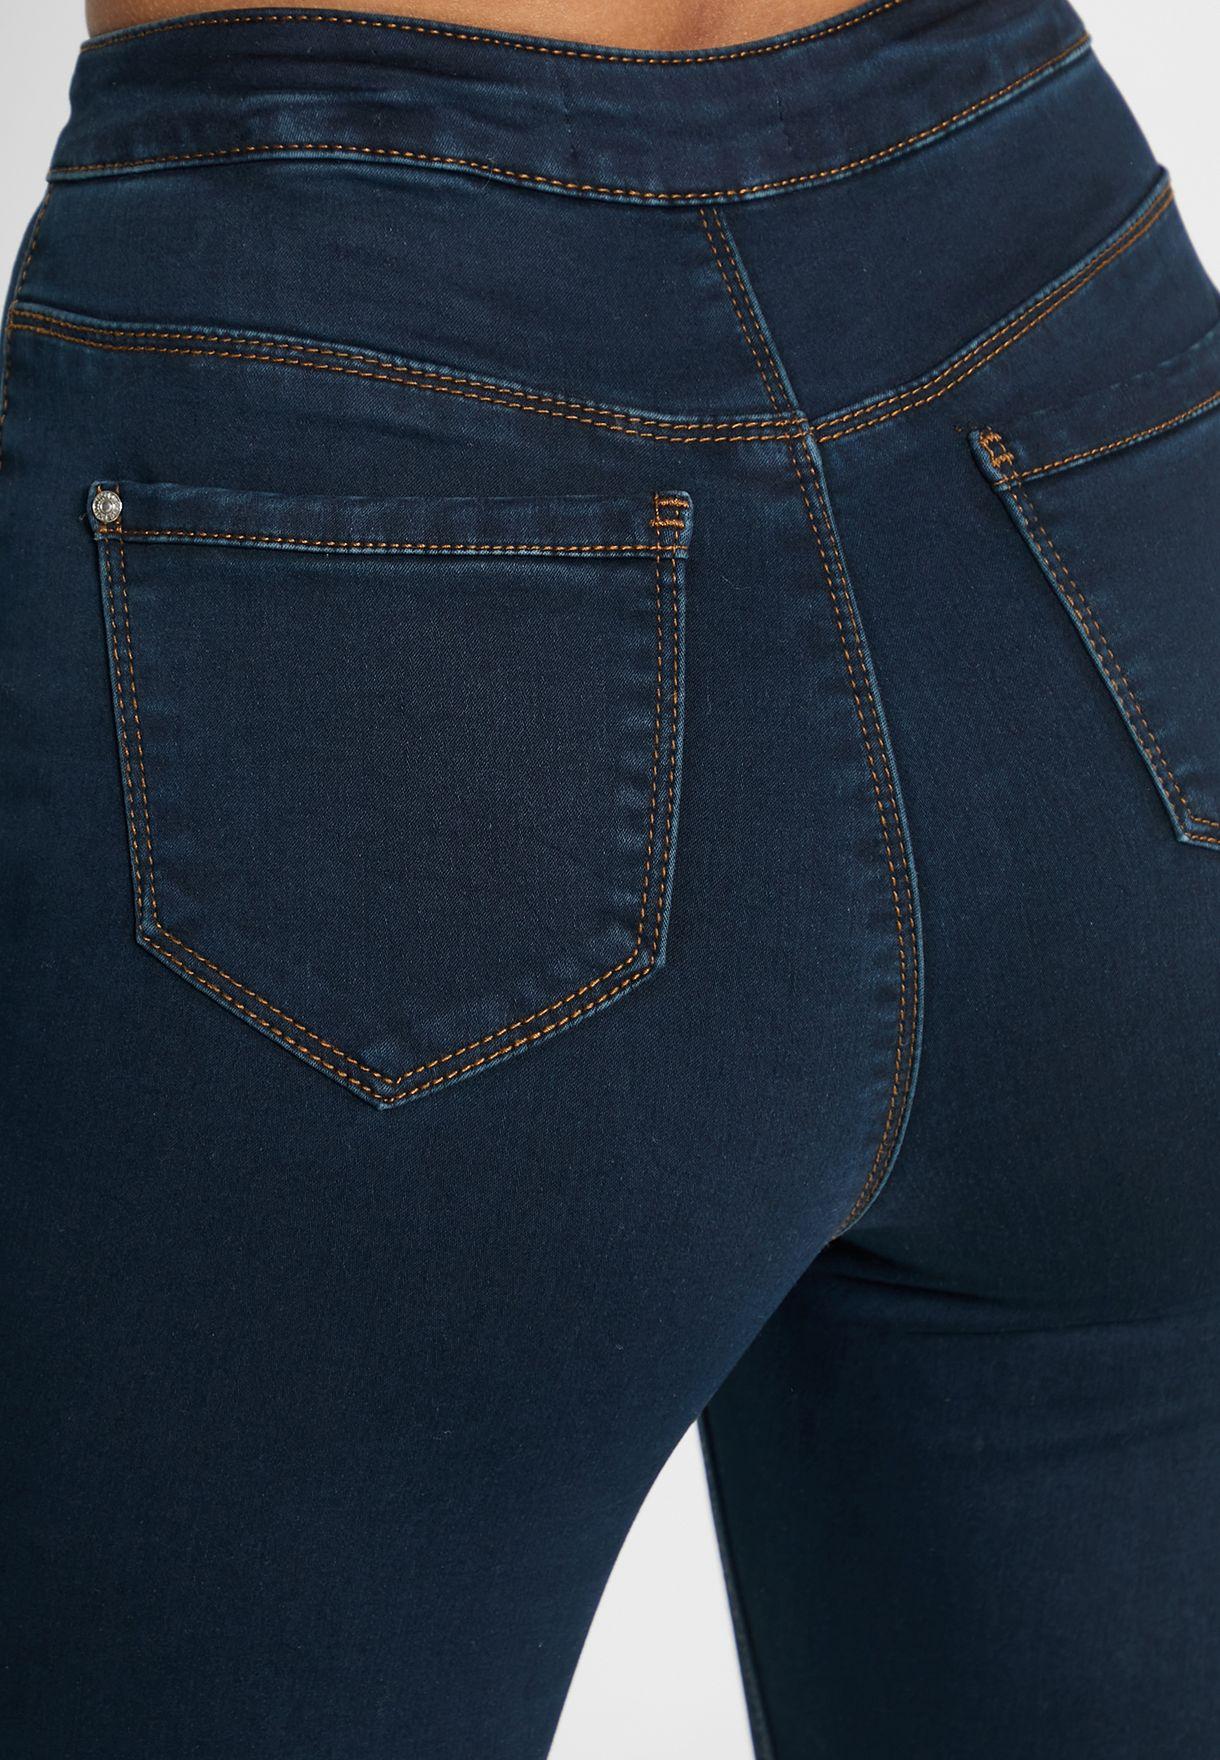 Vice High-waisted Skinny Jeans